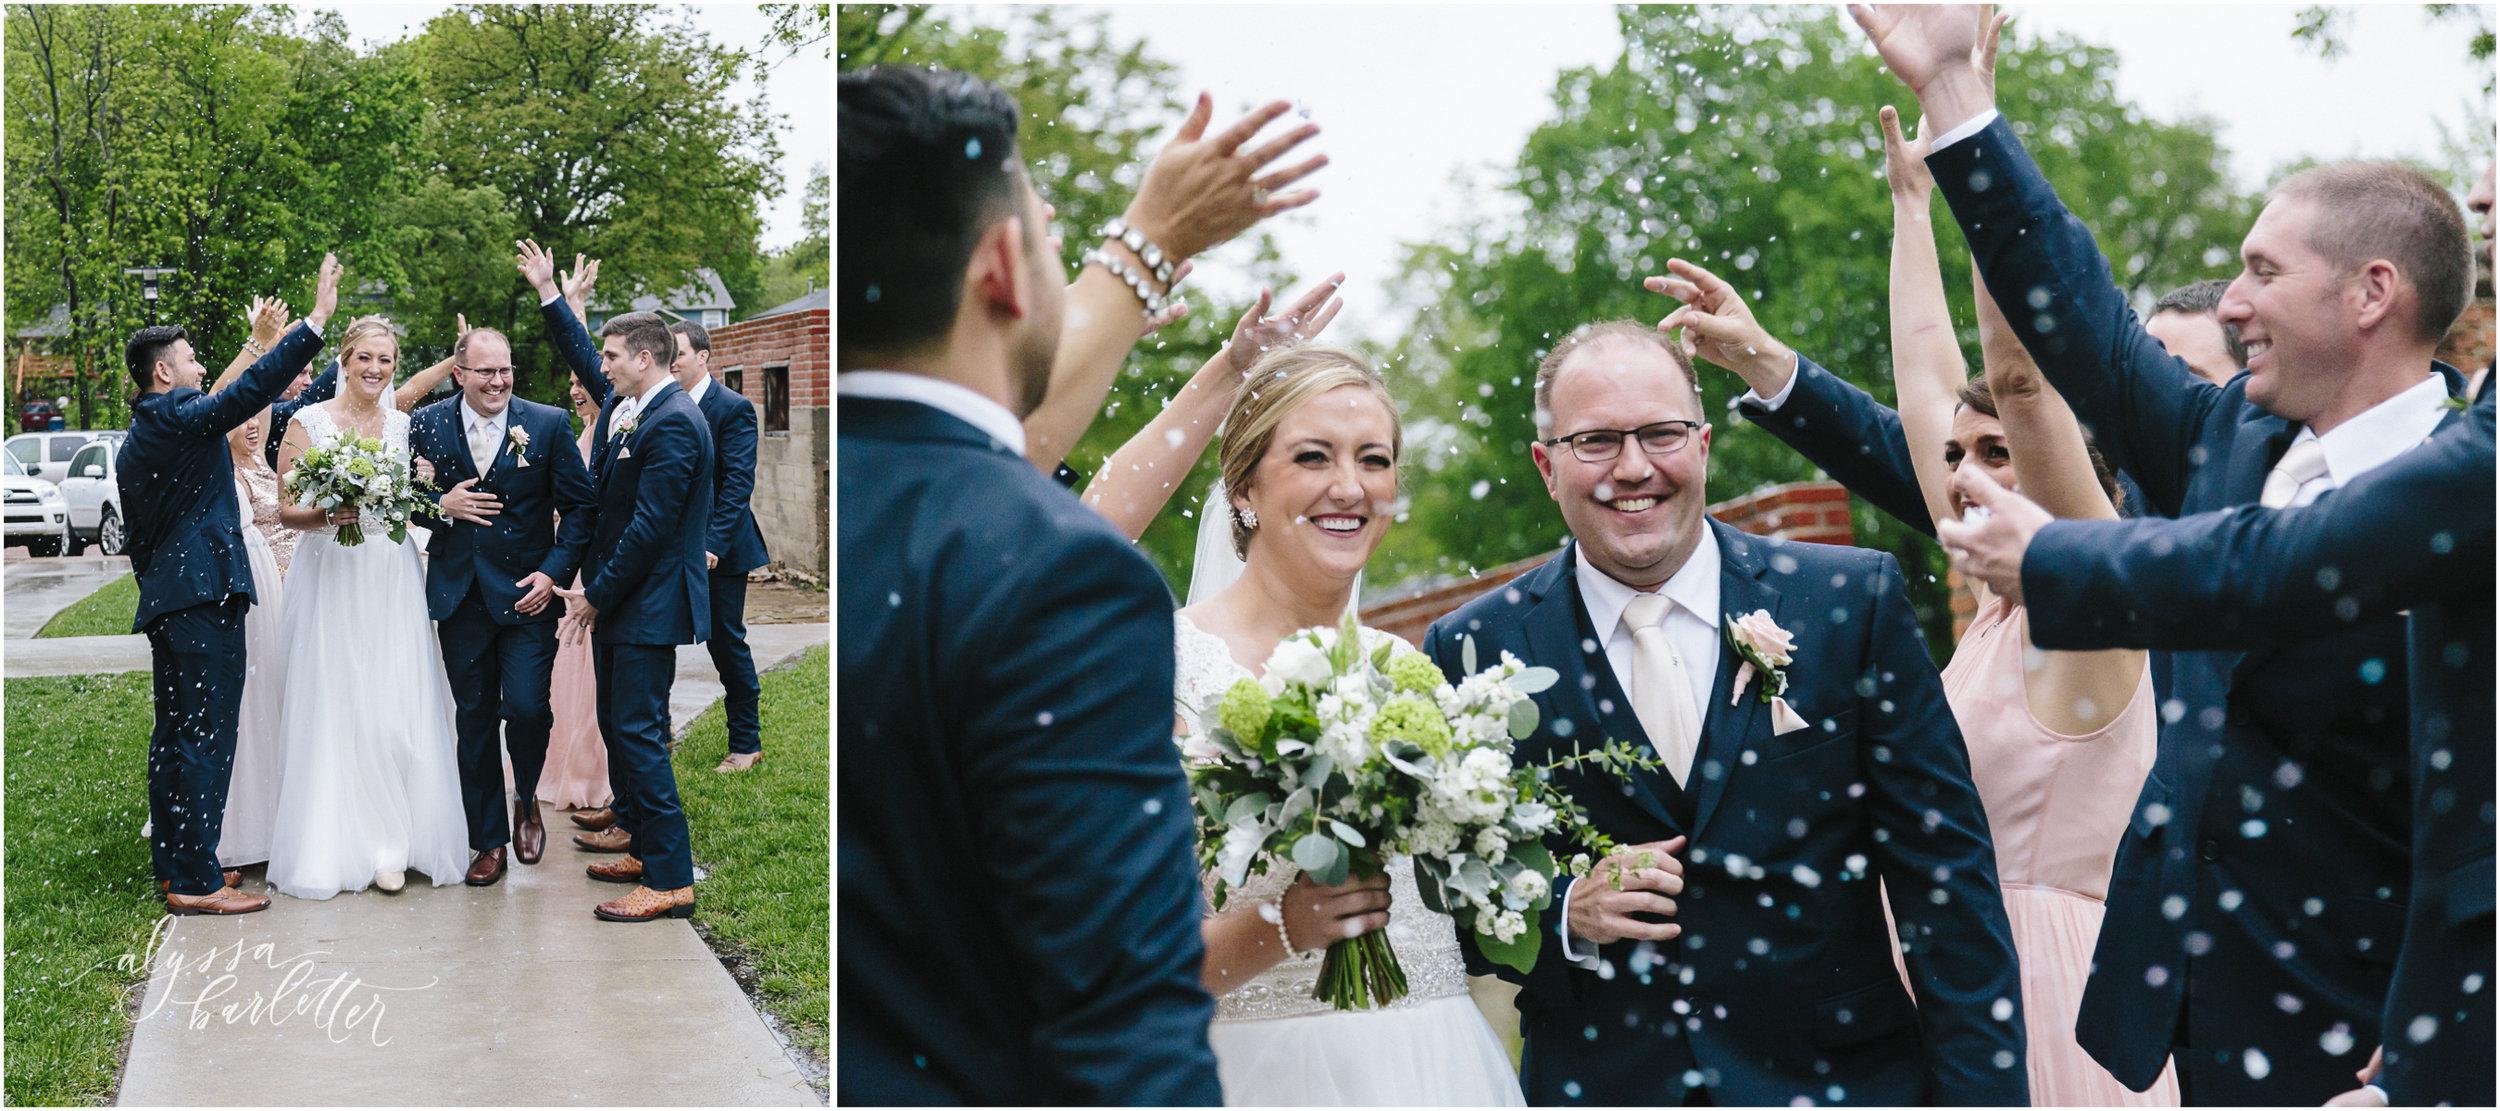 alyssa barletter photography cider gallery lawrence kansas rainy day wedding megan and brett-1-41.jpg